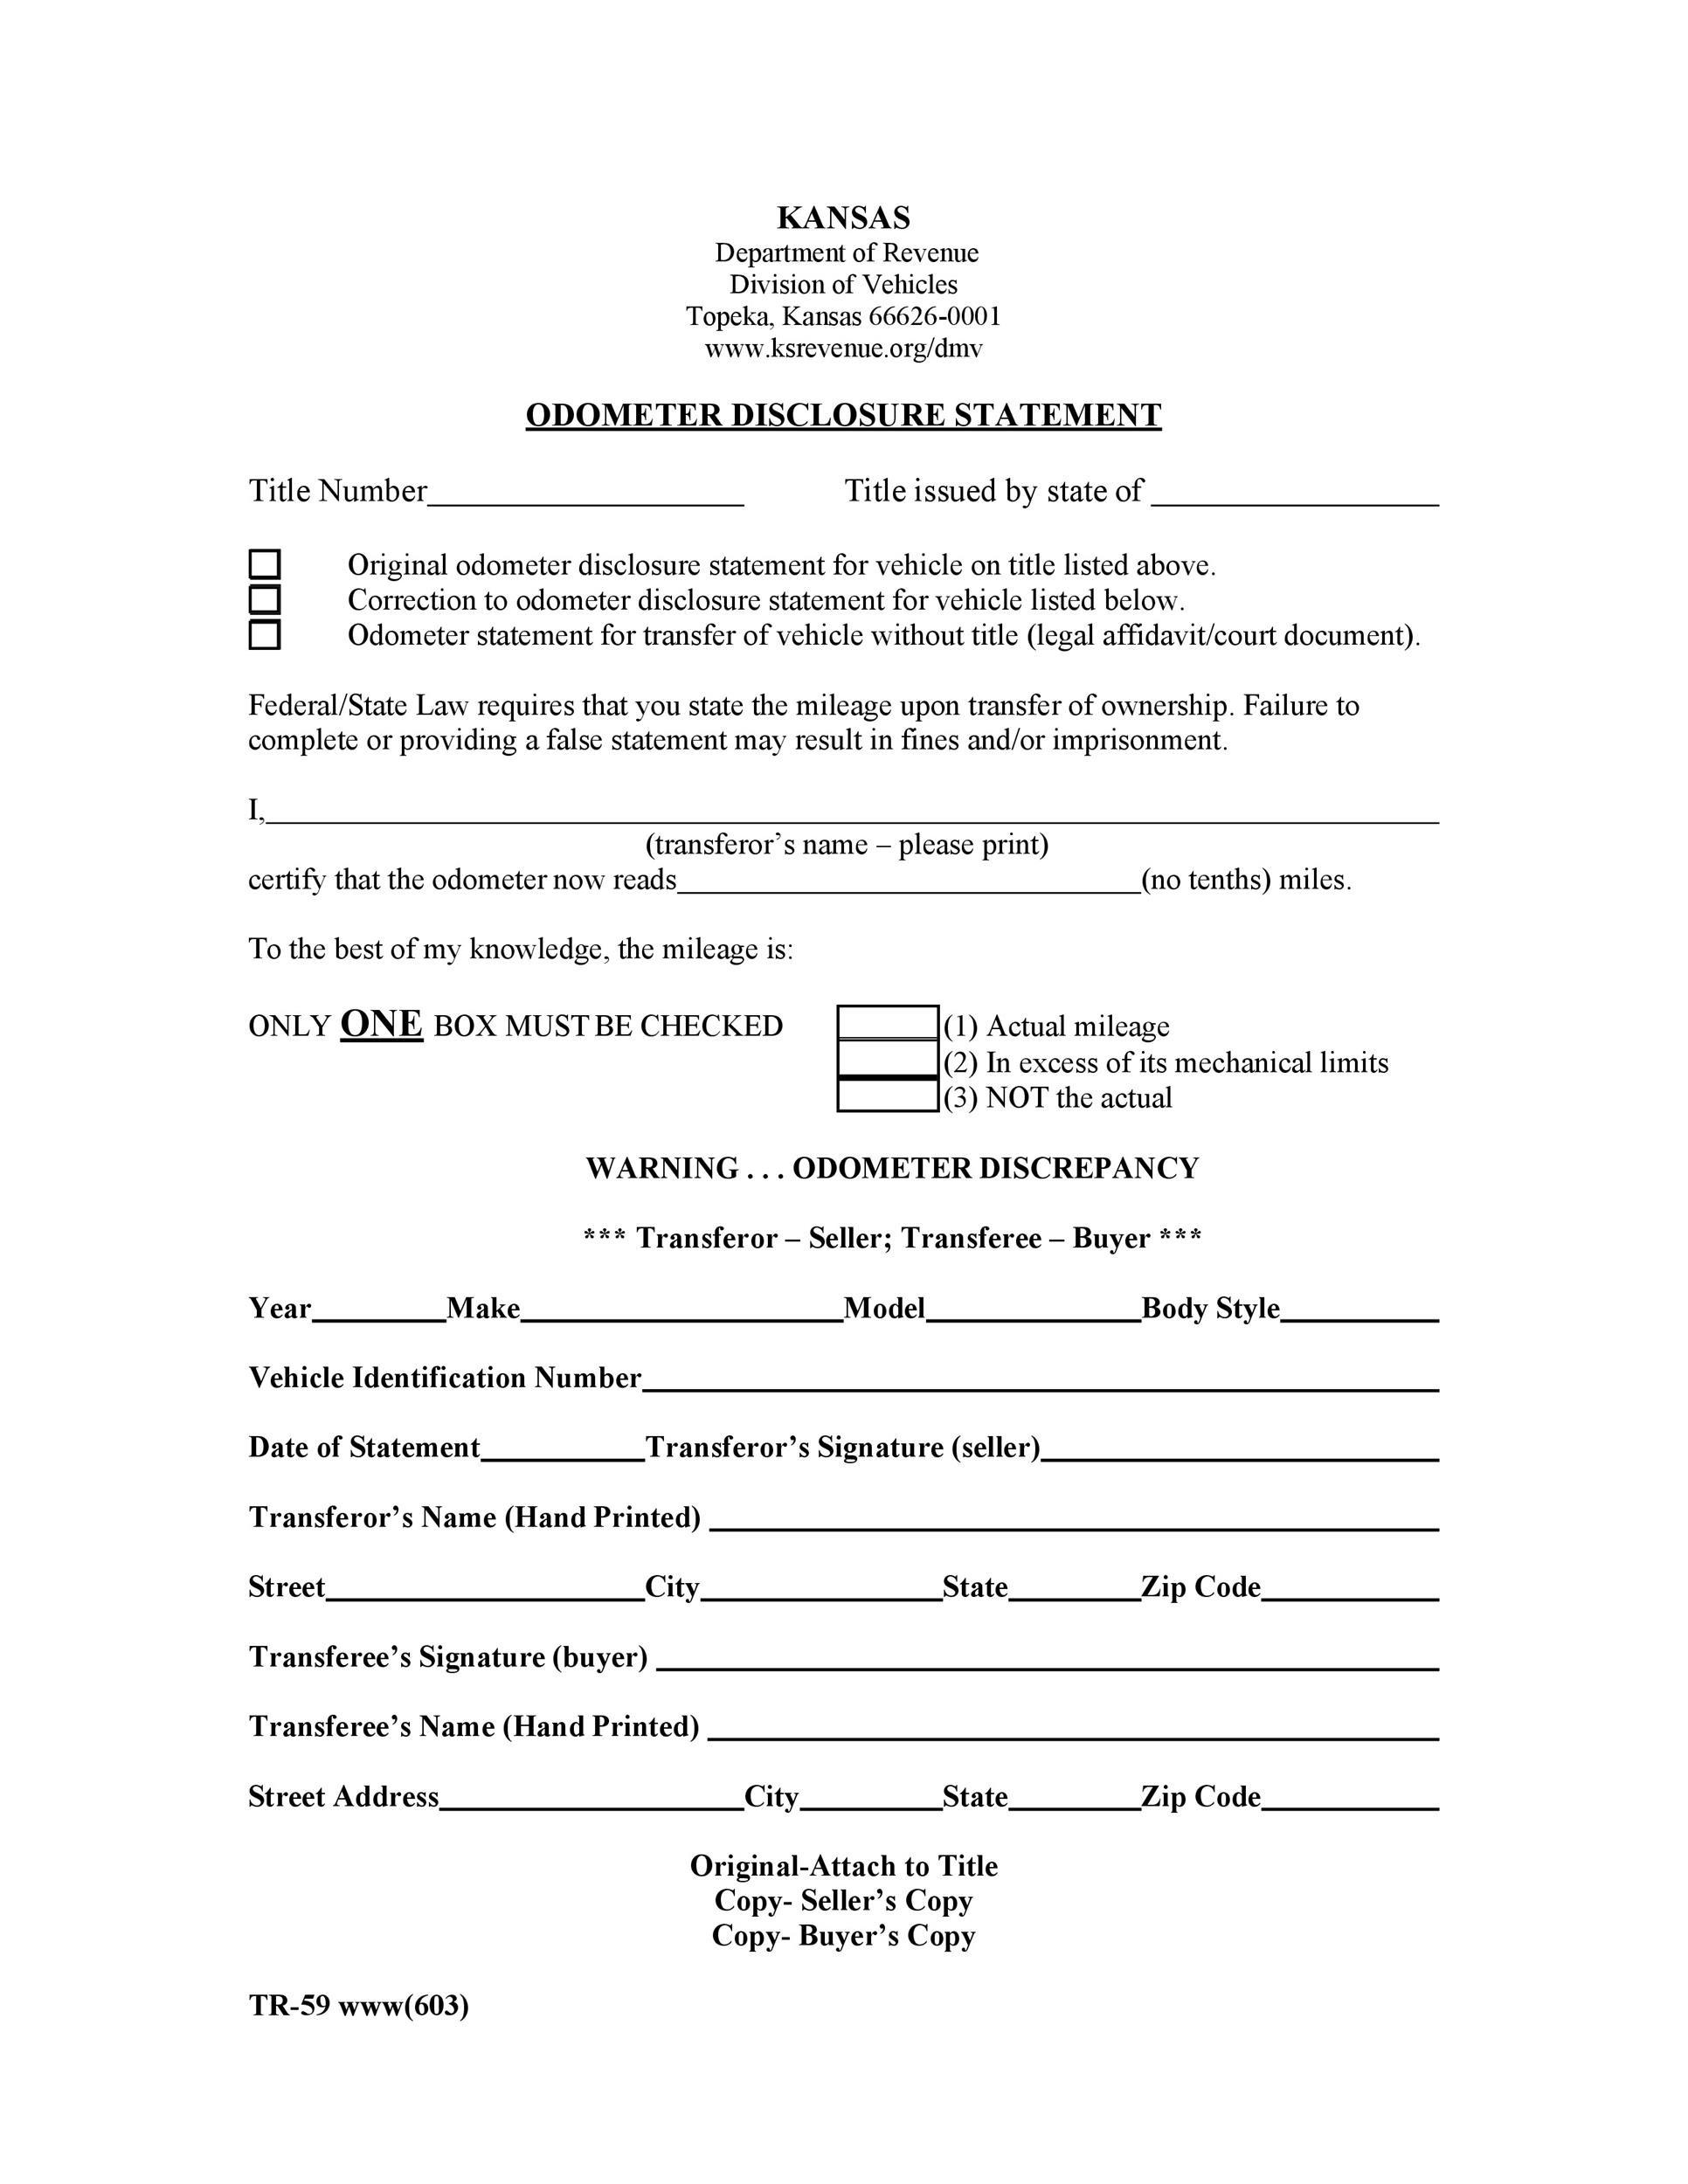 Free odometer disclosure statement 43